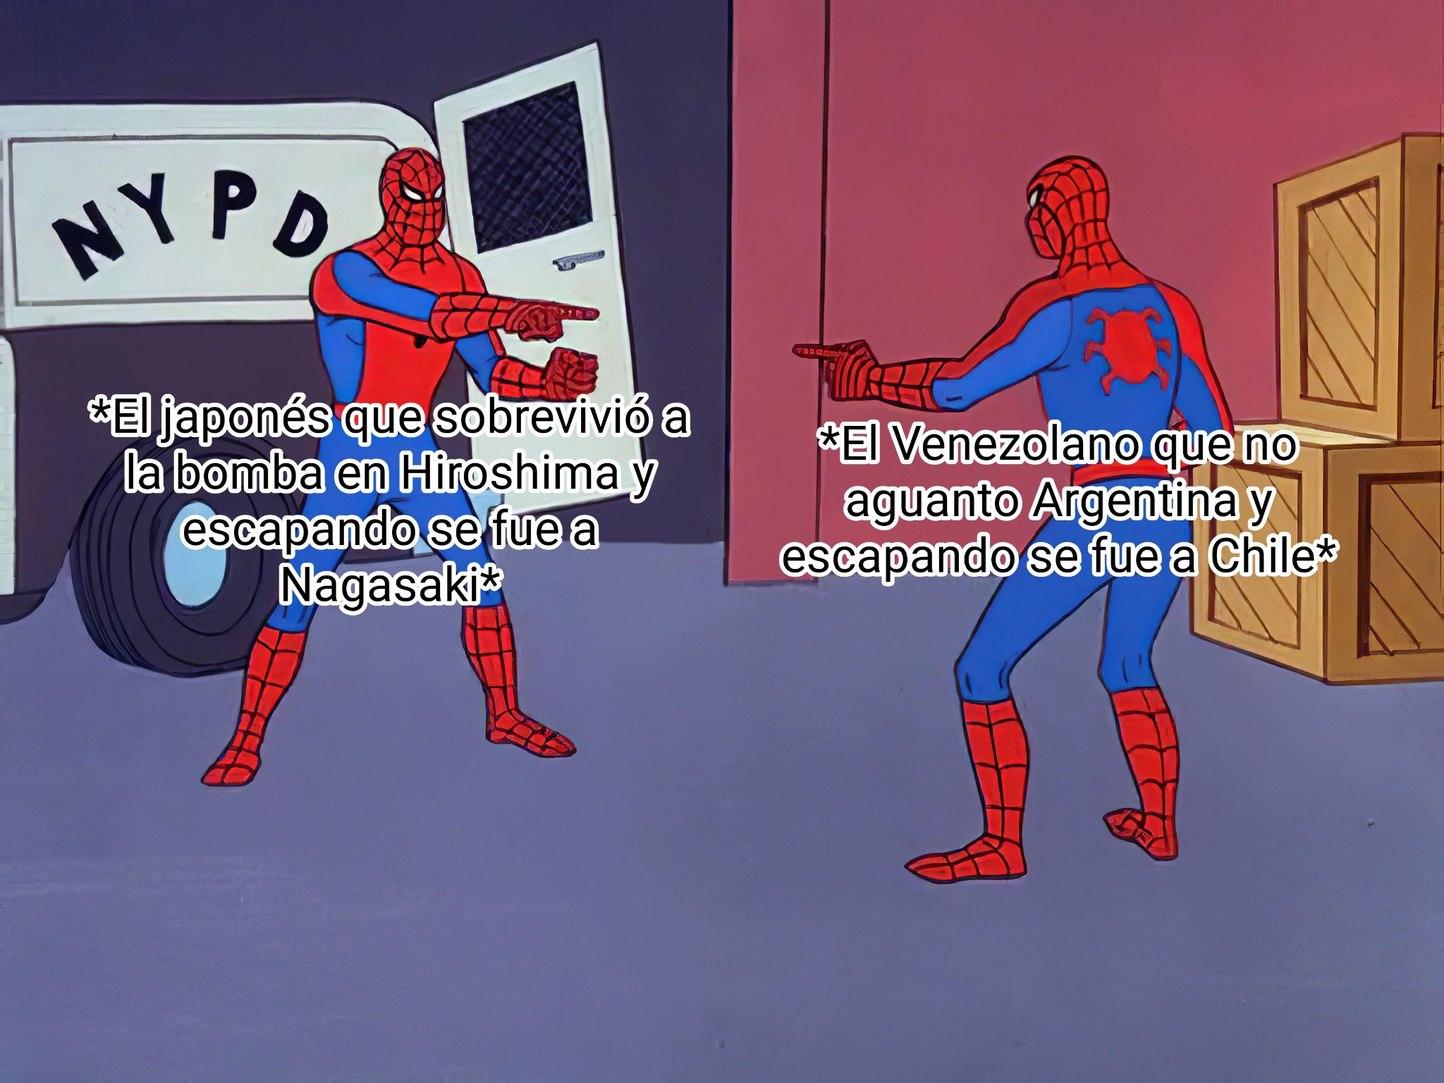 Uff con ir a Argentina era suficiente - meme